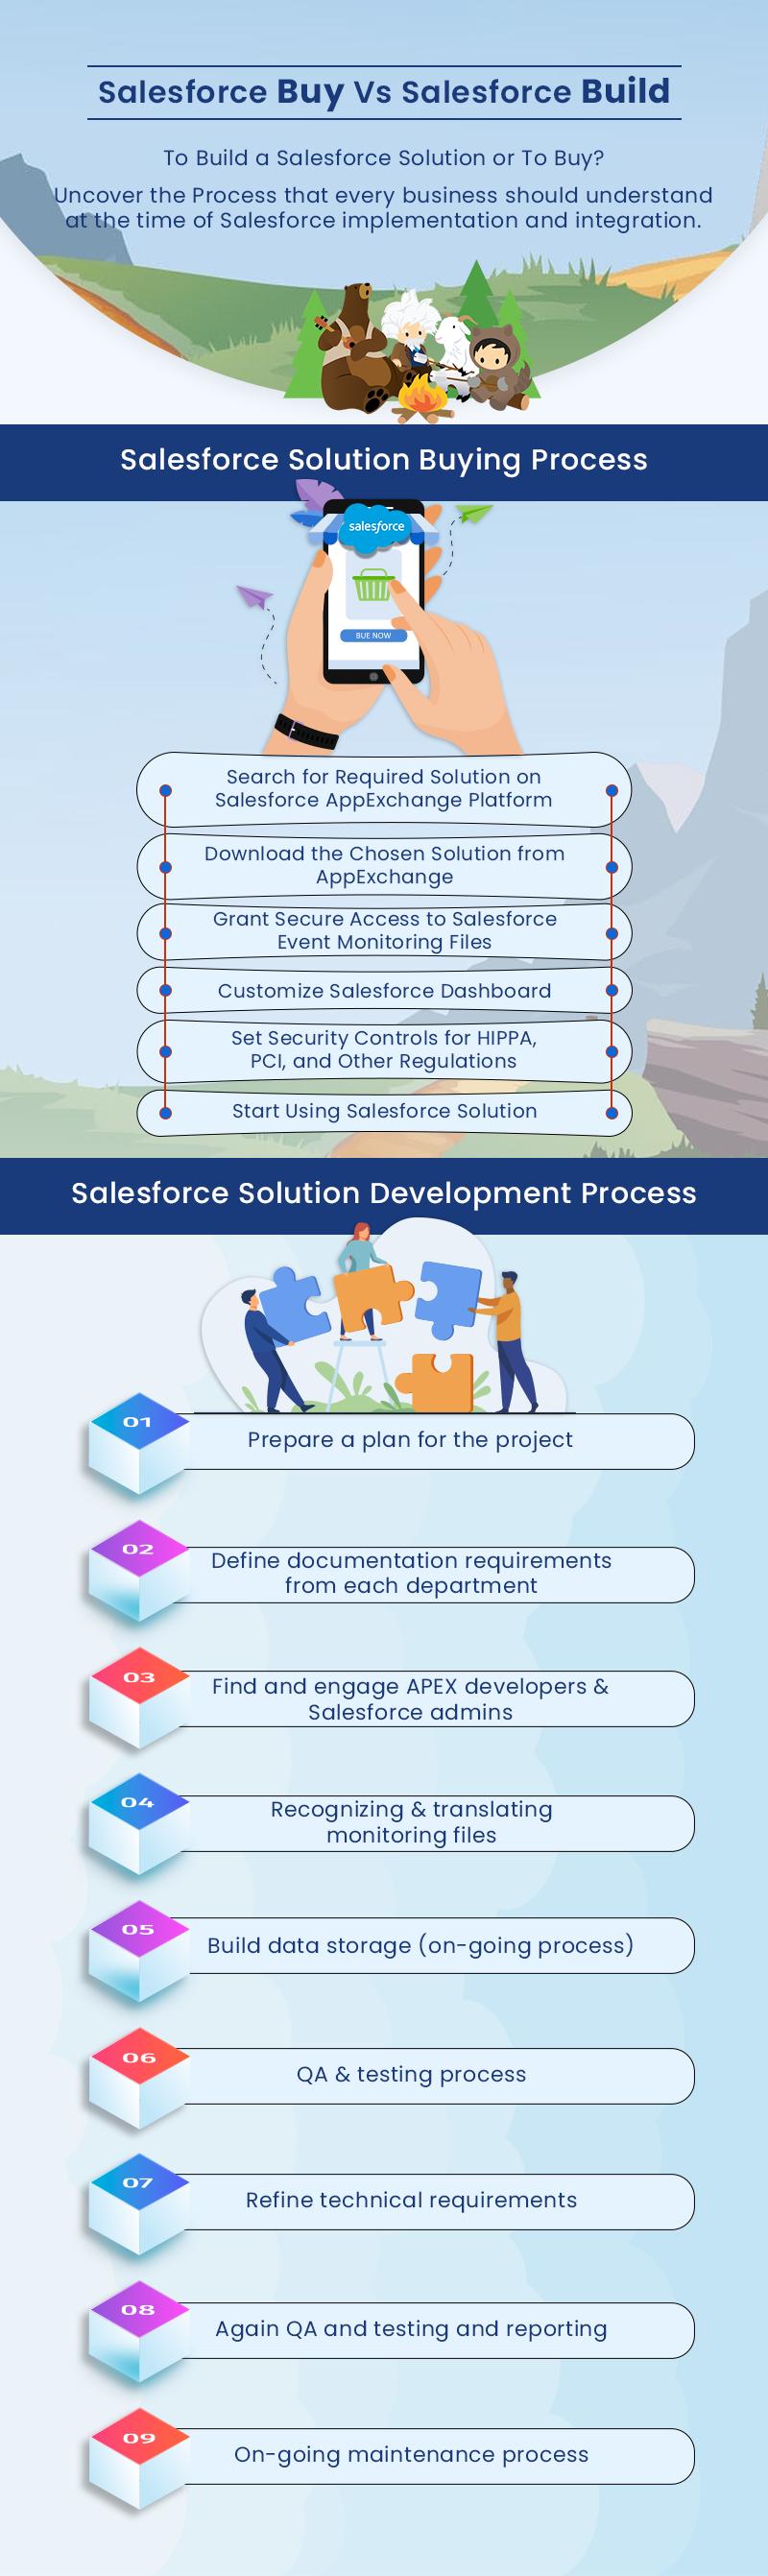 Salesforce Buy Vs Salesforce Build - An Infographic